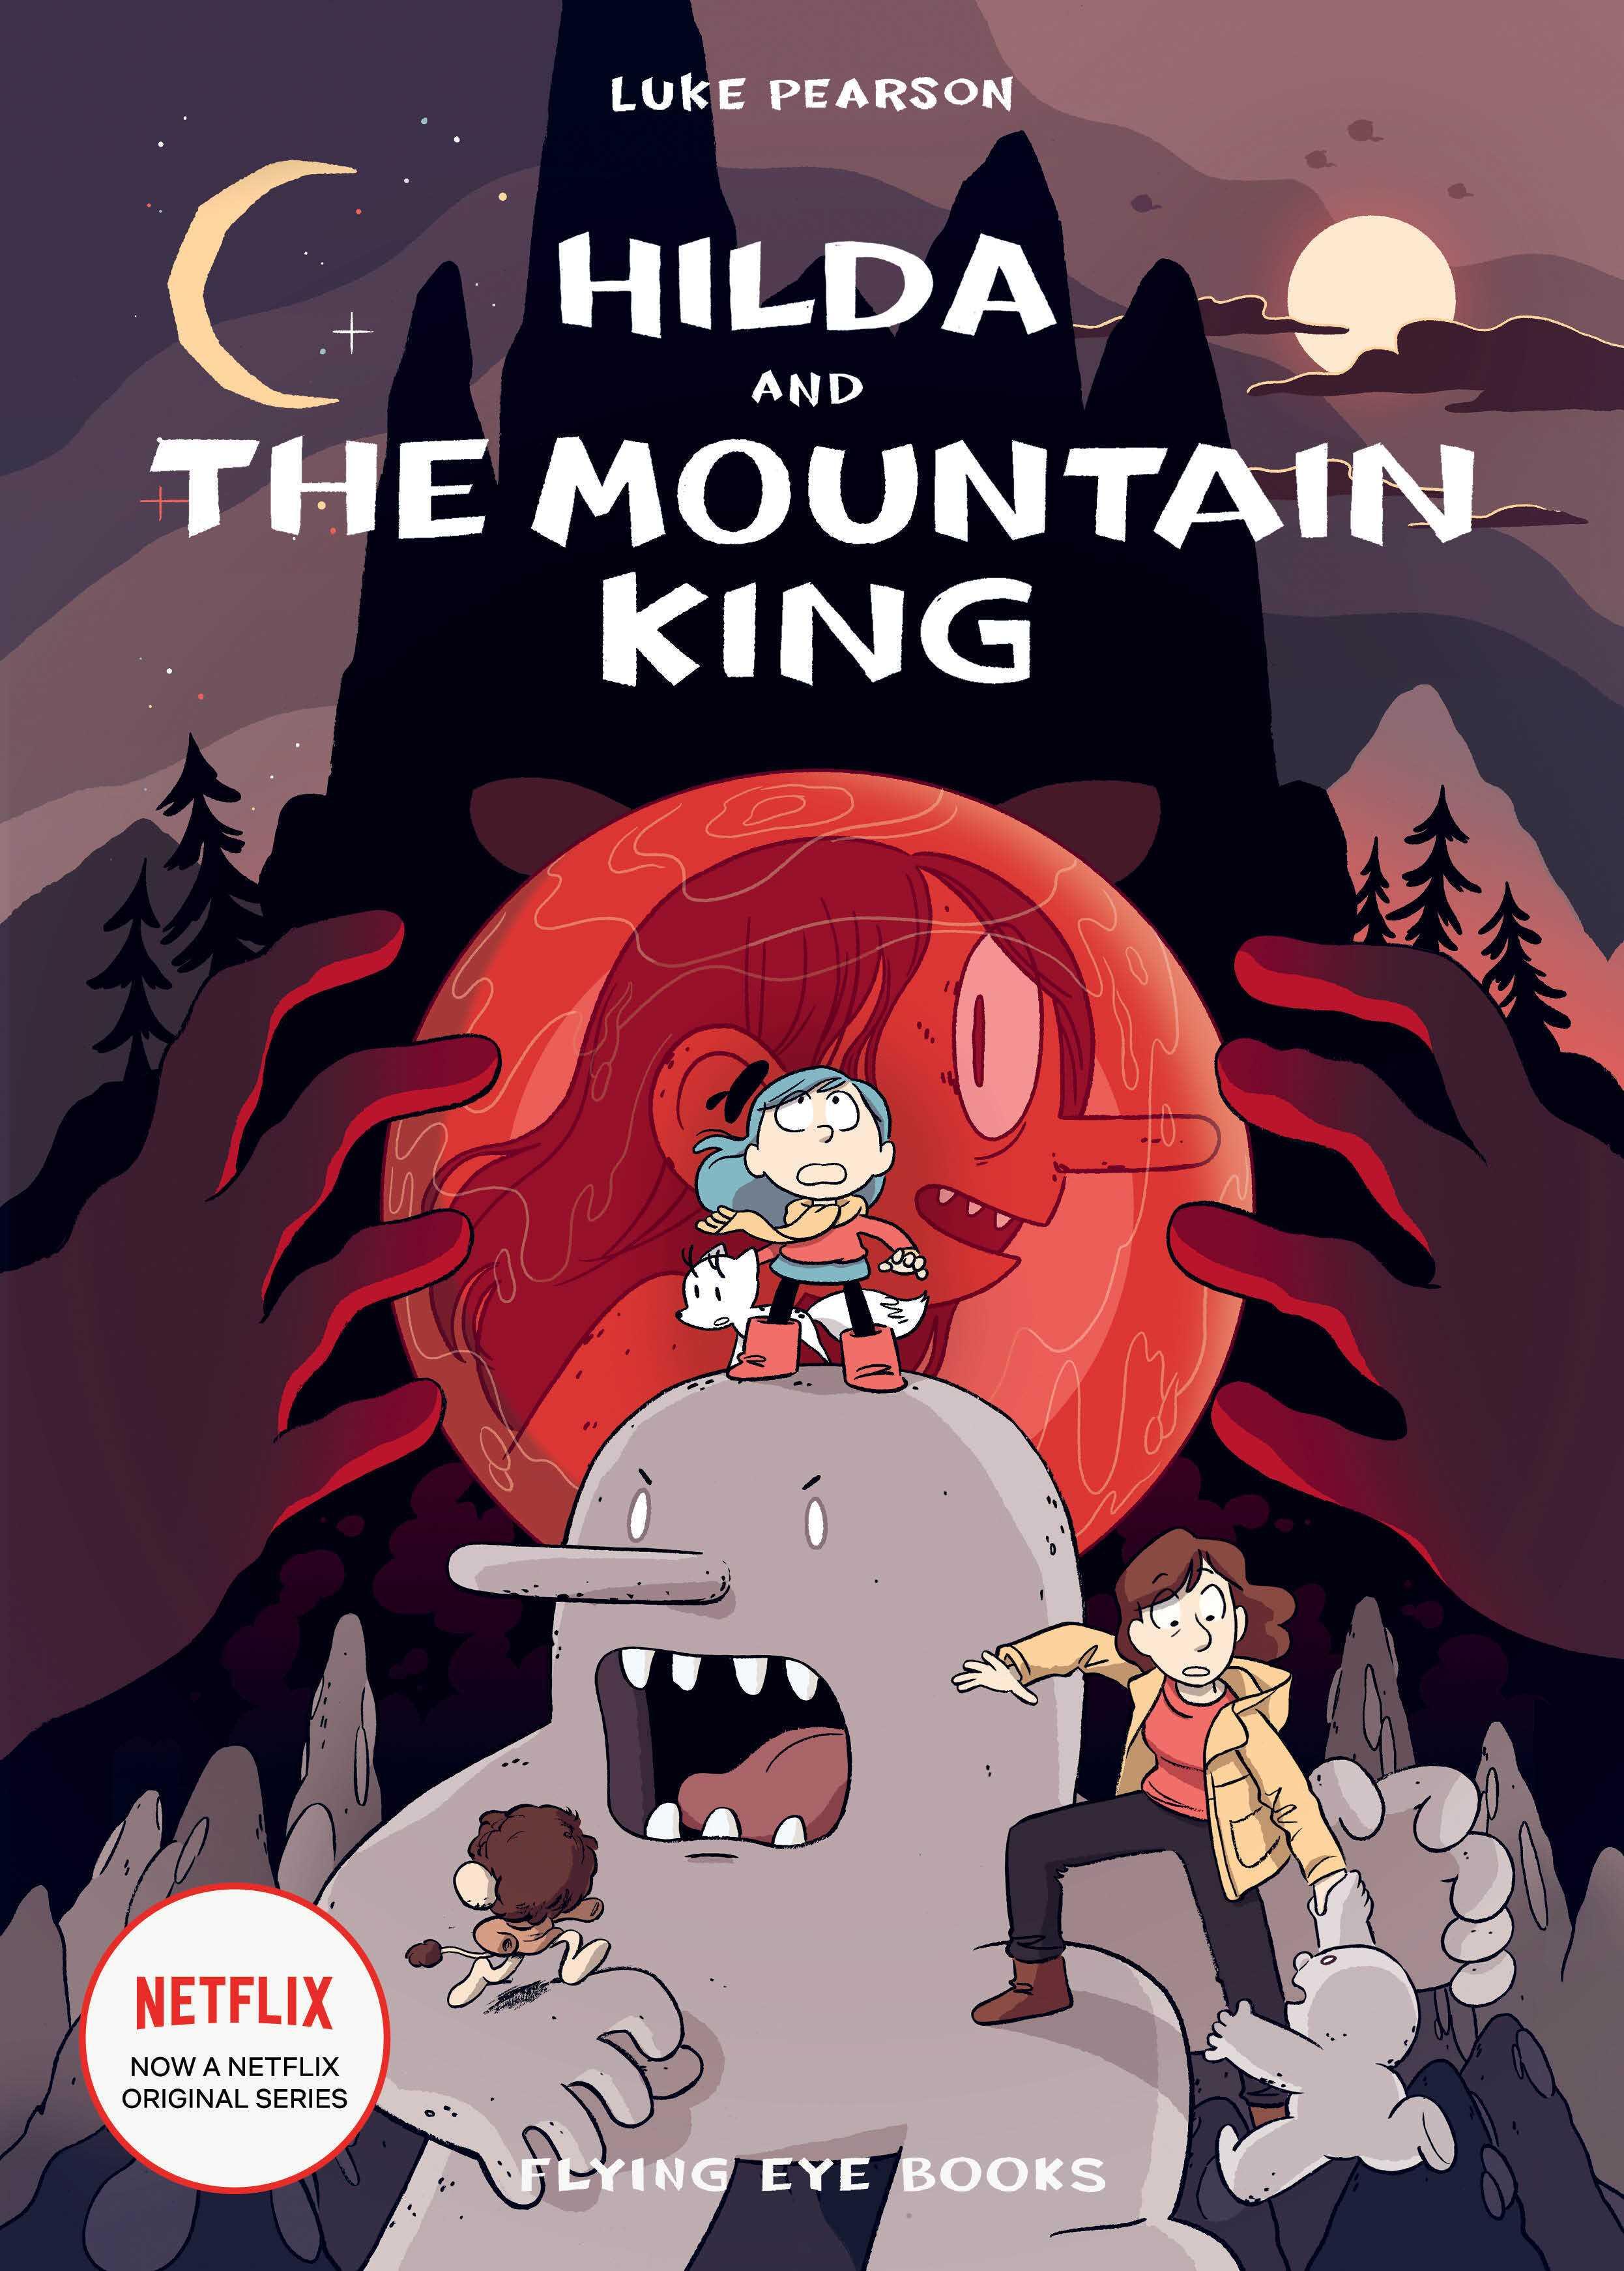 Hilda #06: Hilda and the Mountain King